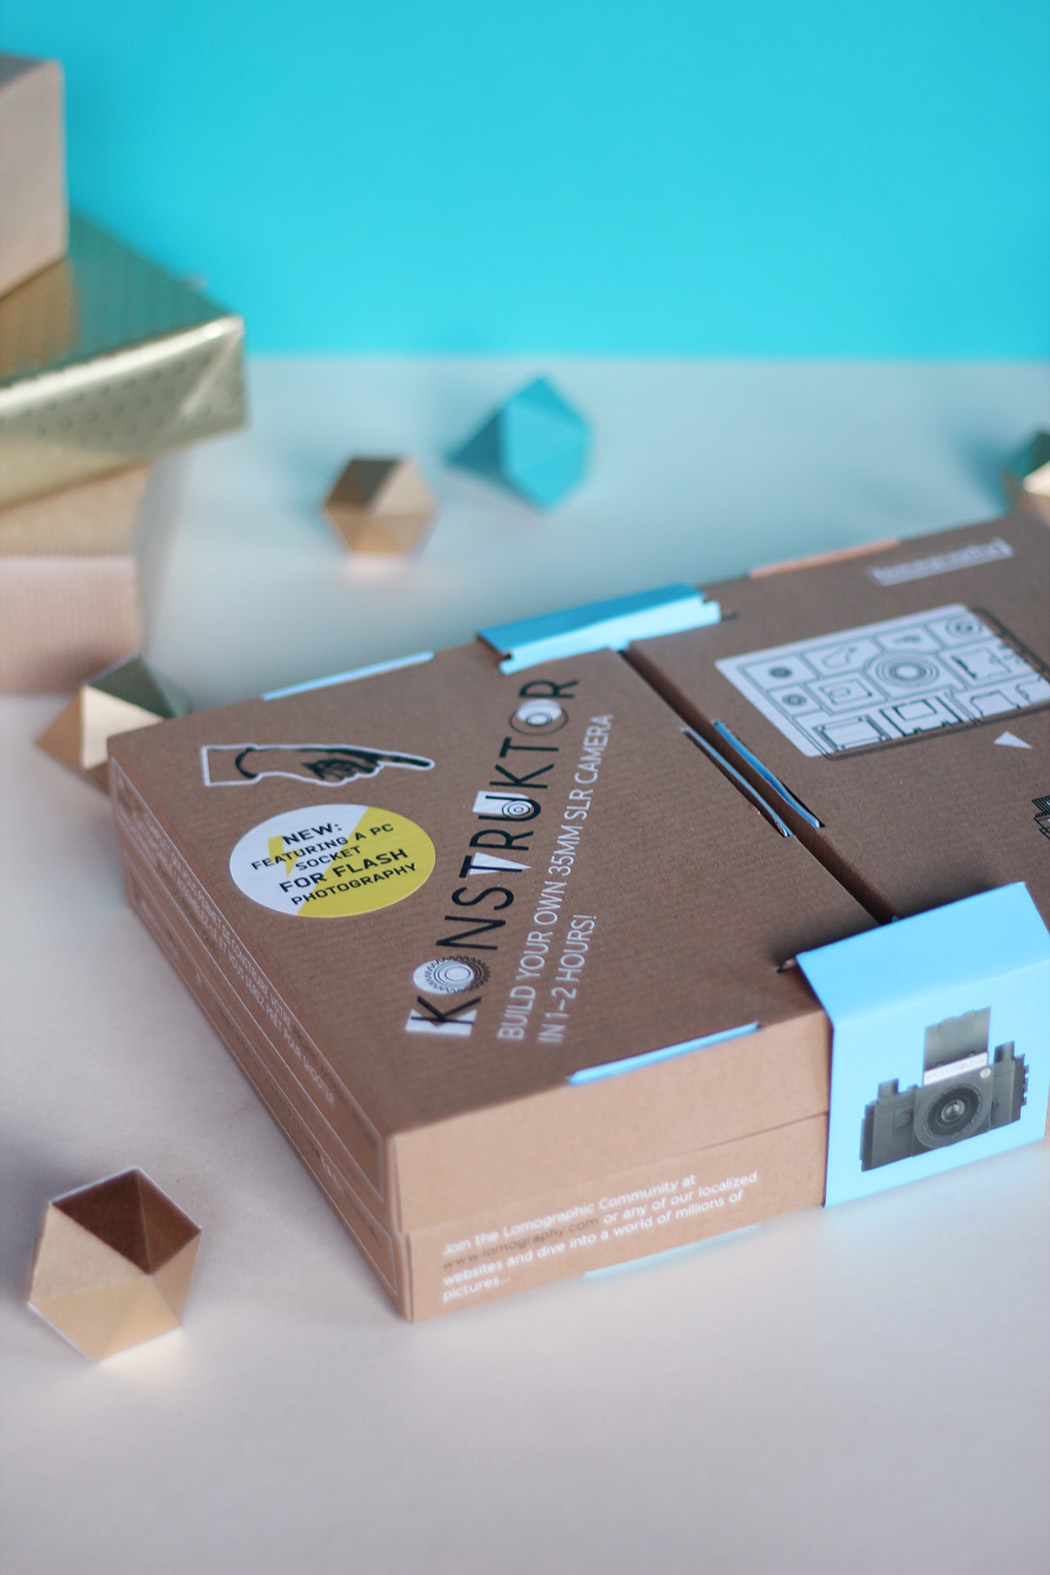 Appareil photo DIY Konstruktor de Lomography - Cadeau de Noël - Juliette blog féminin